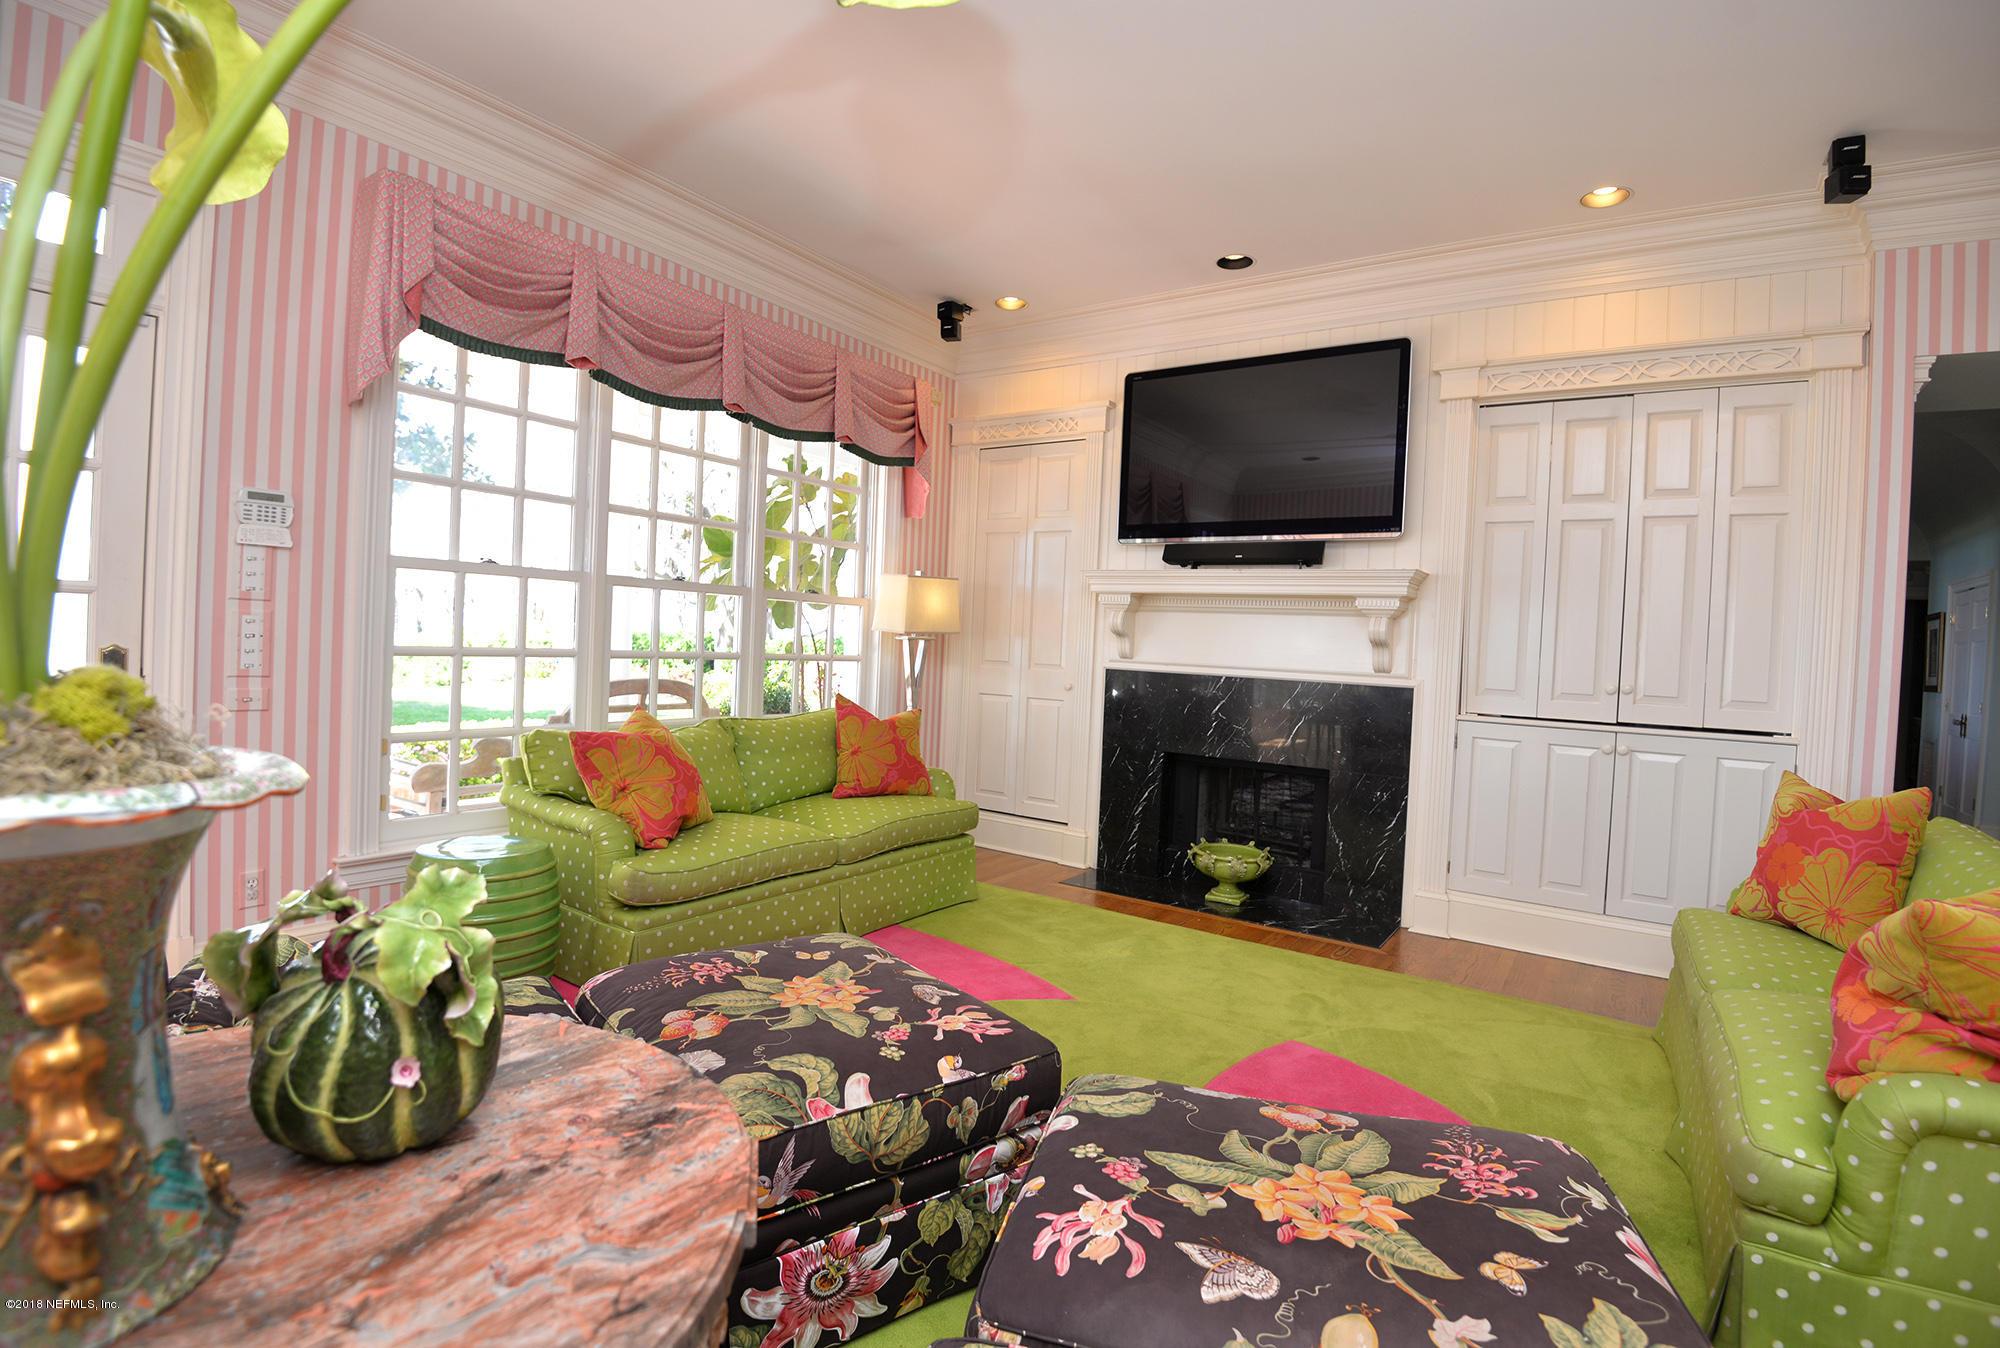 6148 SAN JOSE, JACKSONVILLE, FLORIDA 32217, 4 Bedrooms Bedrooms, ,4 BathroomsBathrooms,Residential - single family,For sale,SAN JOSE,925791